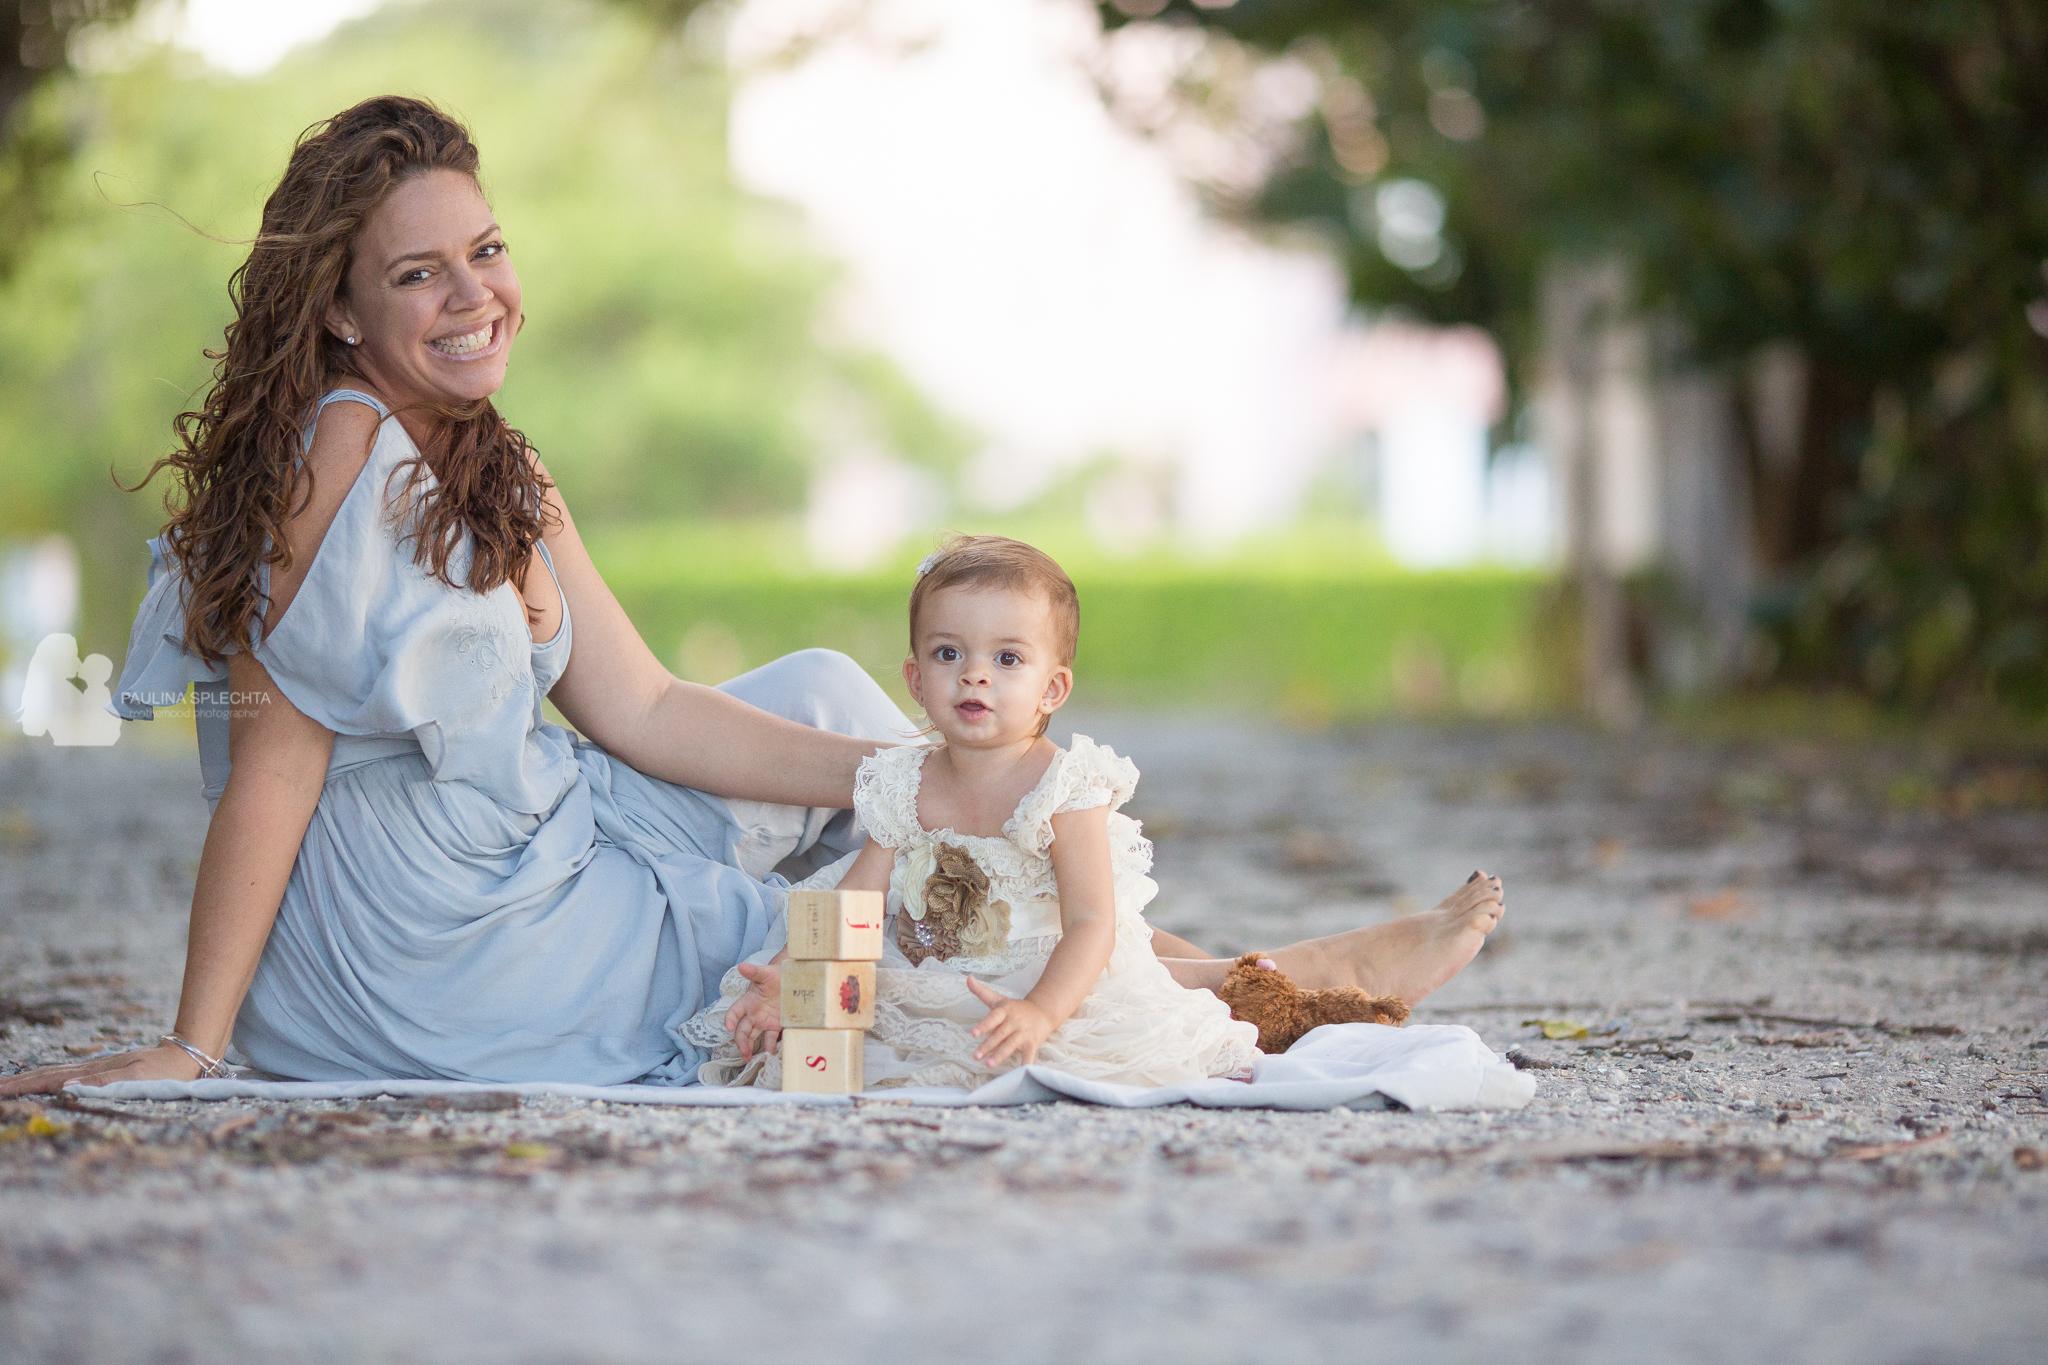 birth-photographer-breastfeeding-family-child-newborn-cake-smash-pregnancy-maternity-18.jpg